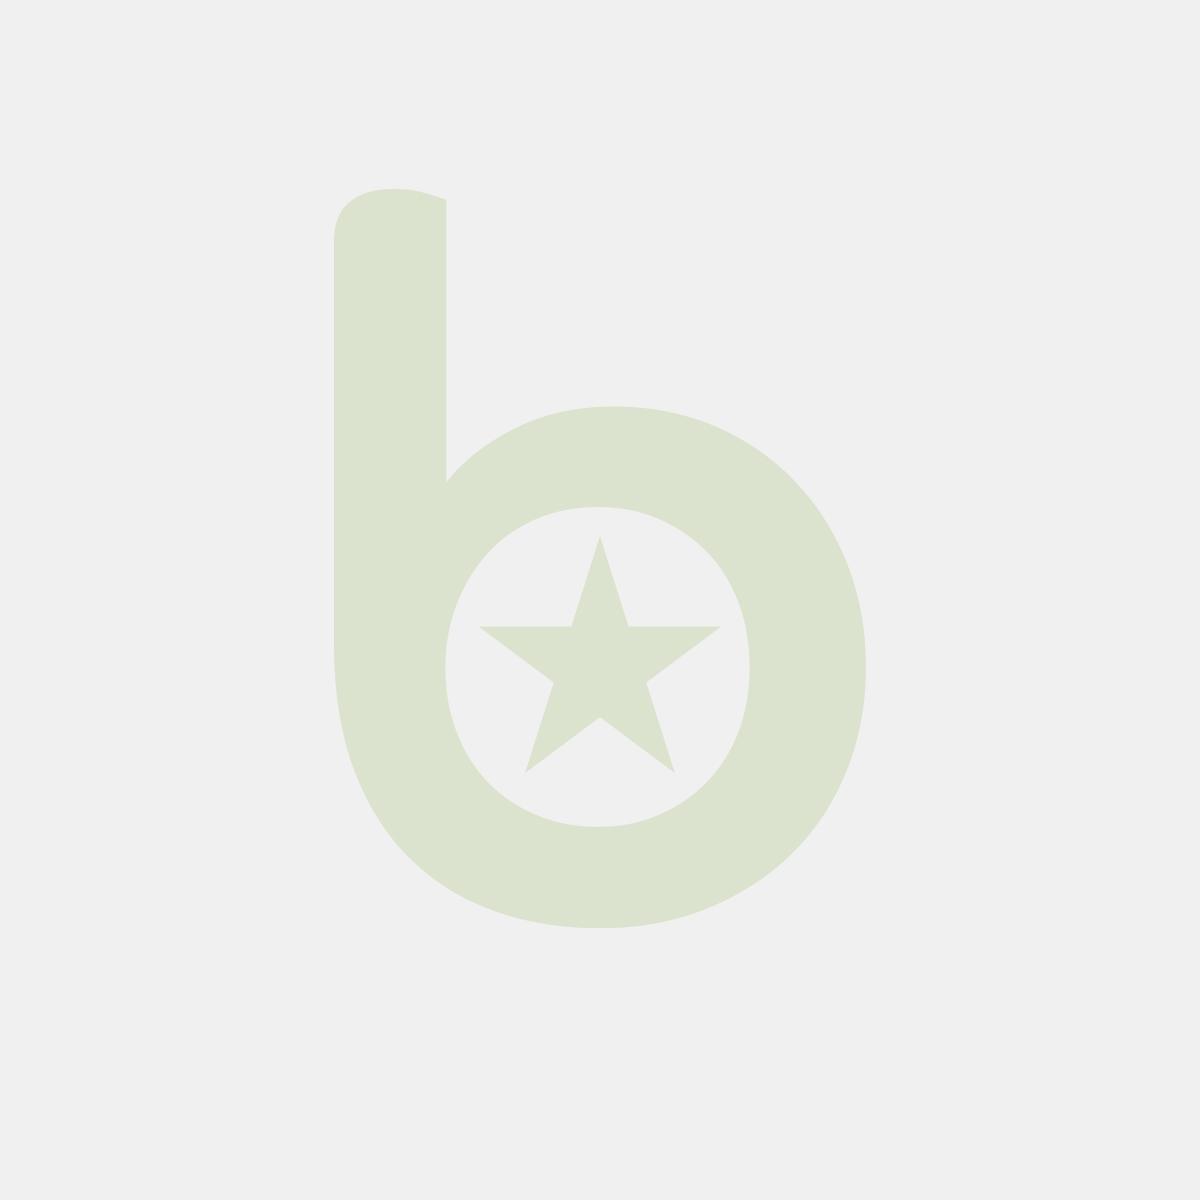 FINGERFOOD - miseczka Nest, trzcina cukrowa, 13,6x10,8x9,3cm op. 15 sztuk